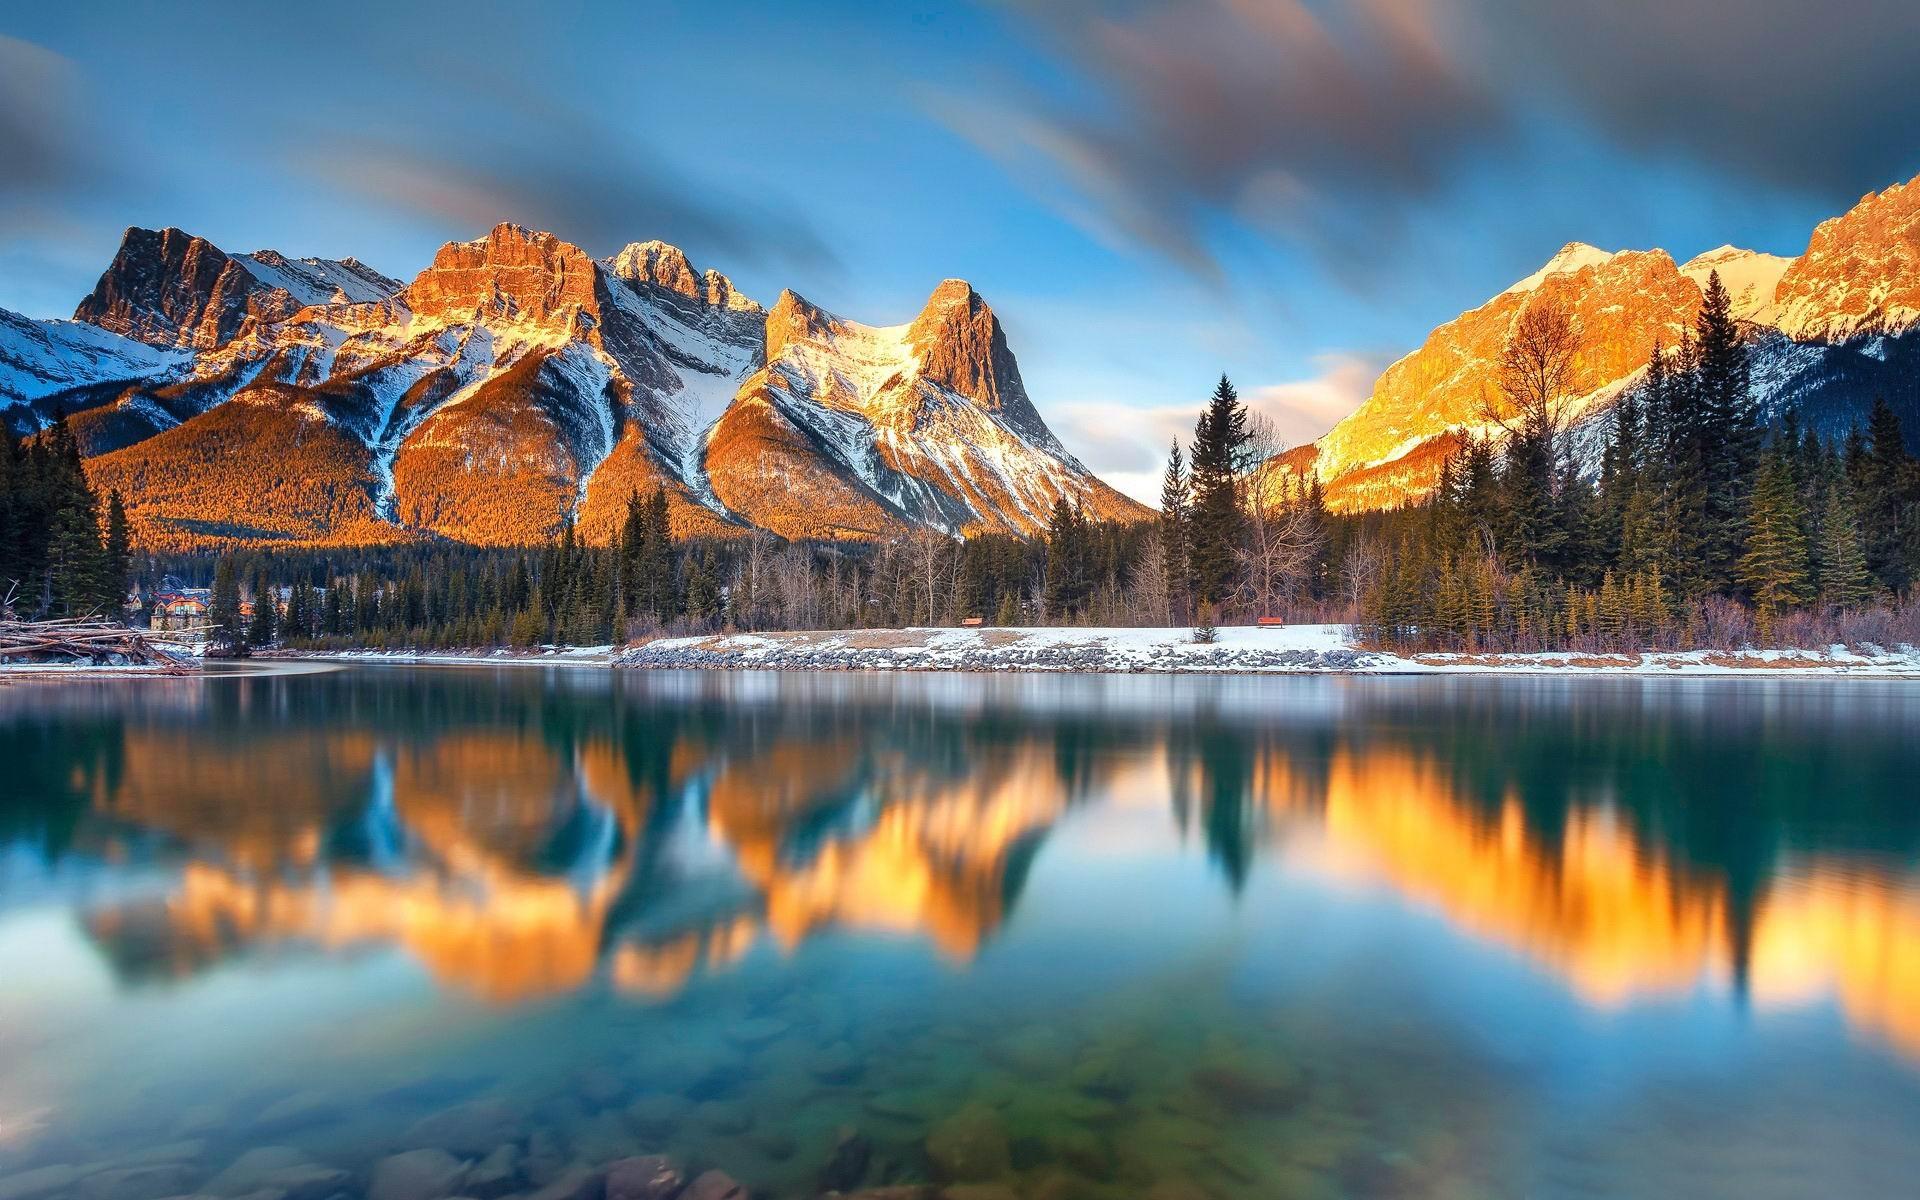 Alberta canada belle nature hd fond d 39 cran 1920x1200 for Belle photo de fond ecran